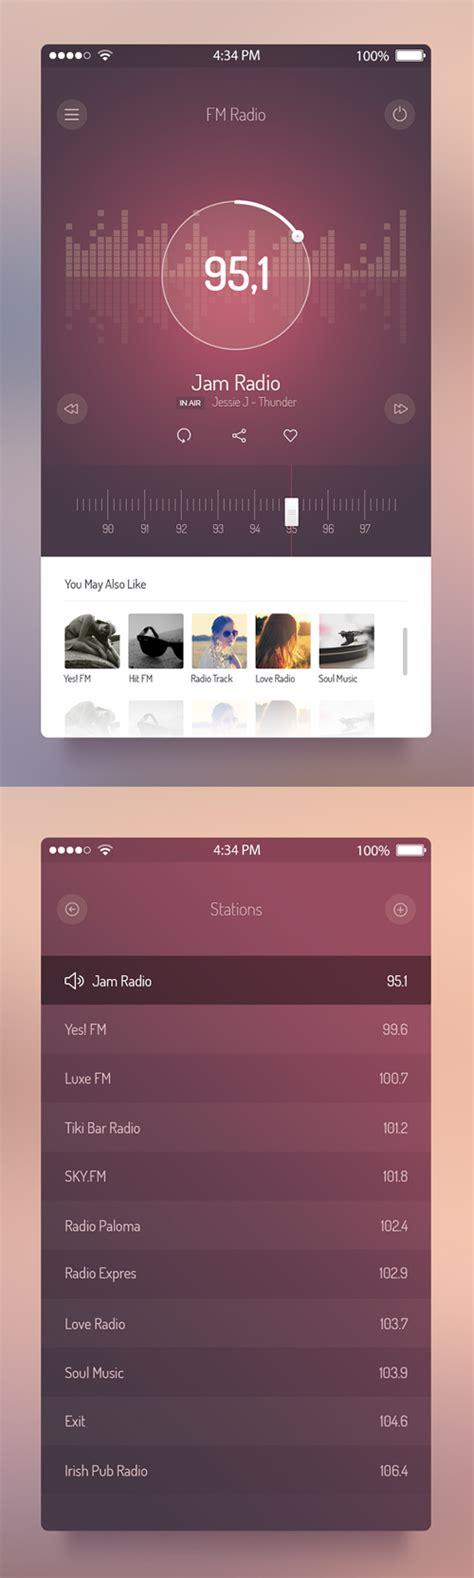 graphic design inspiration ui 50 mobile app ui design for inspiration inspiration